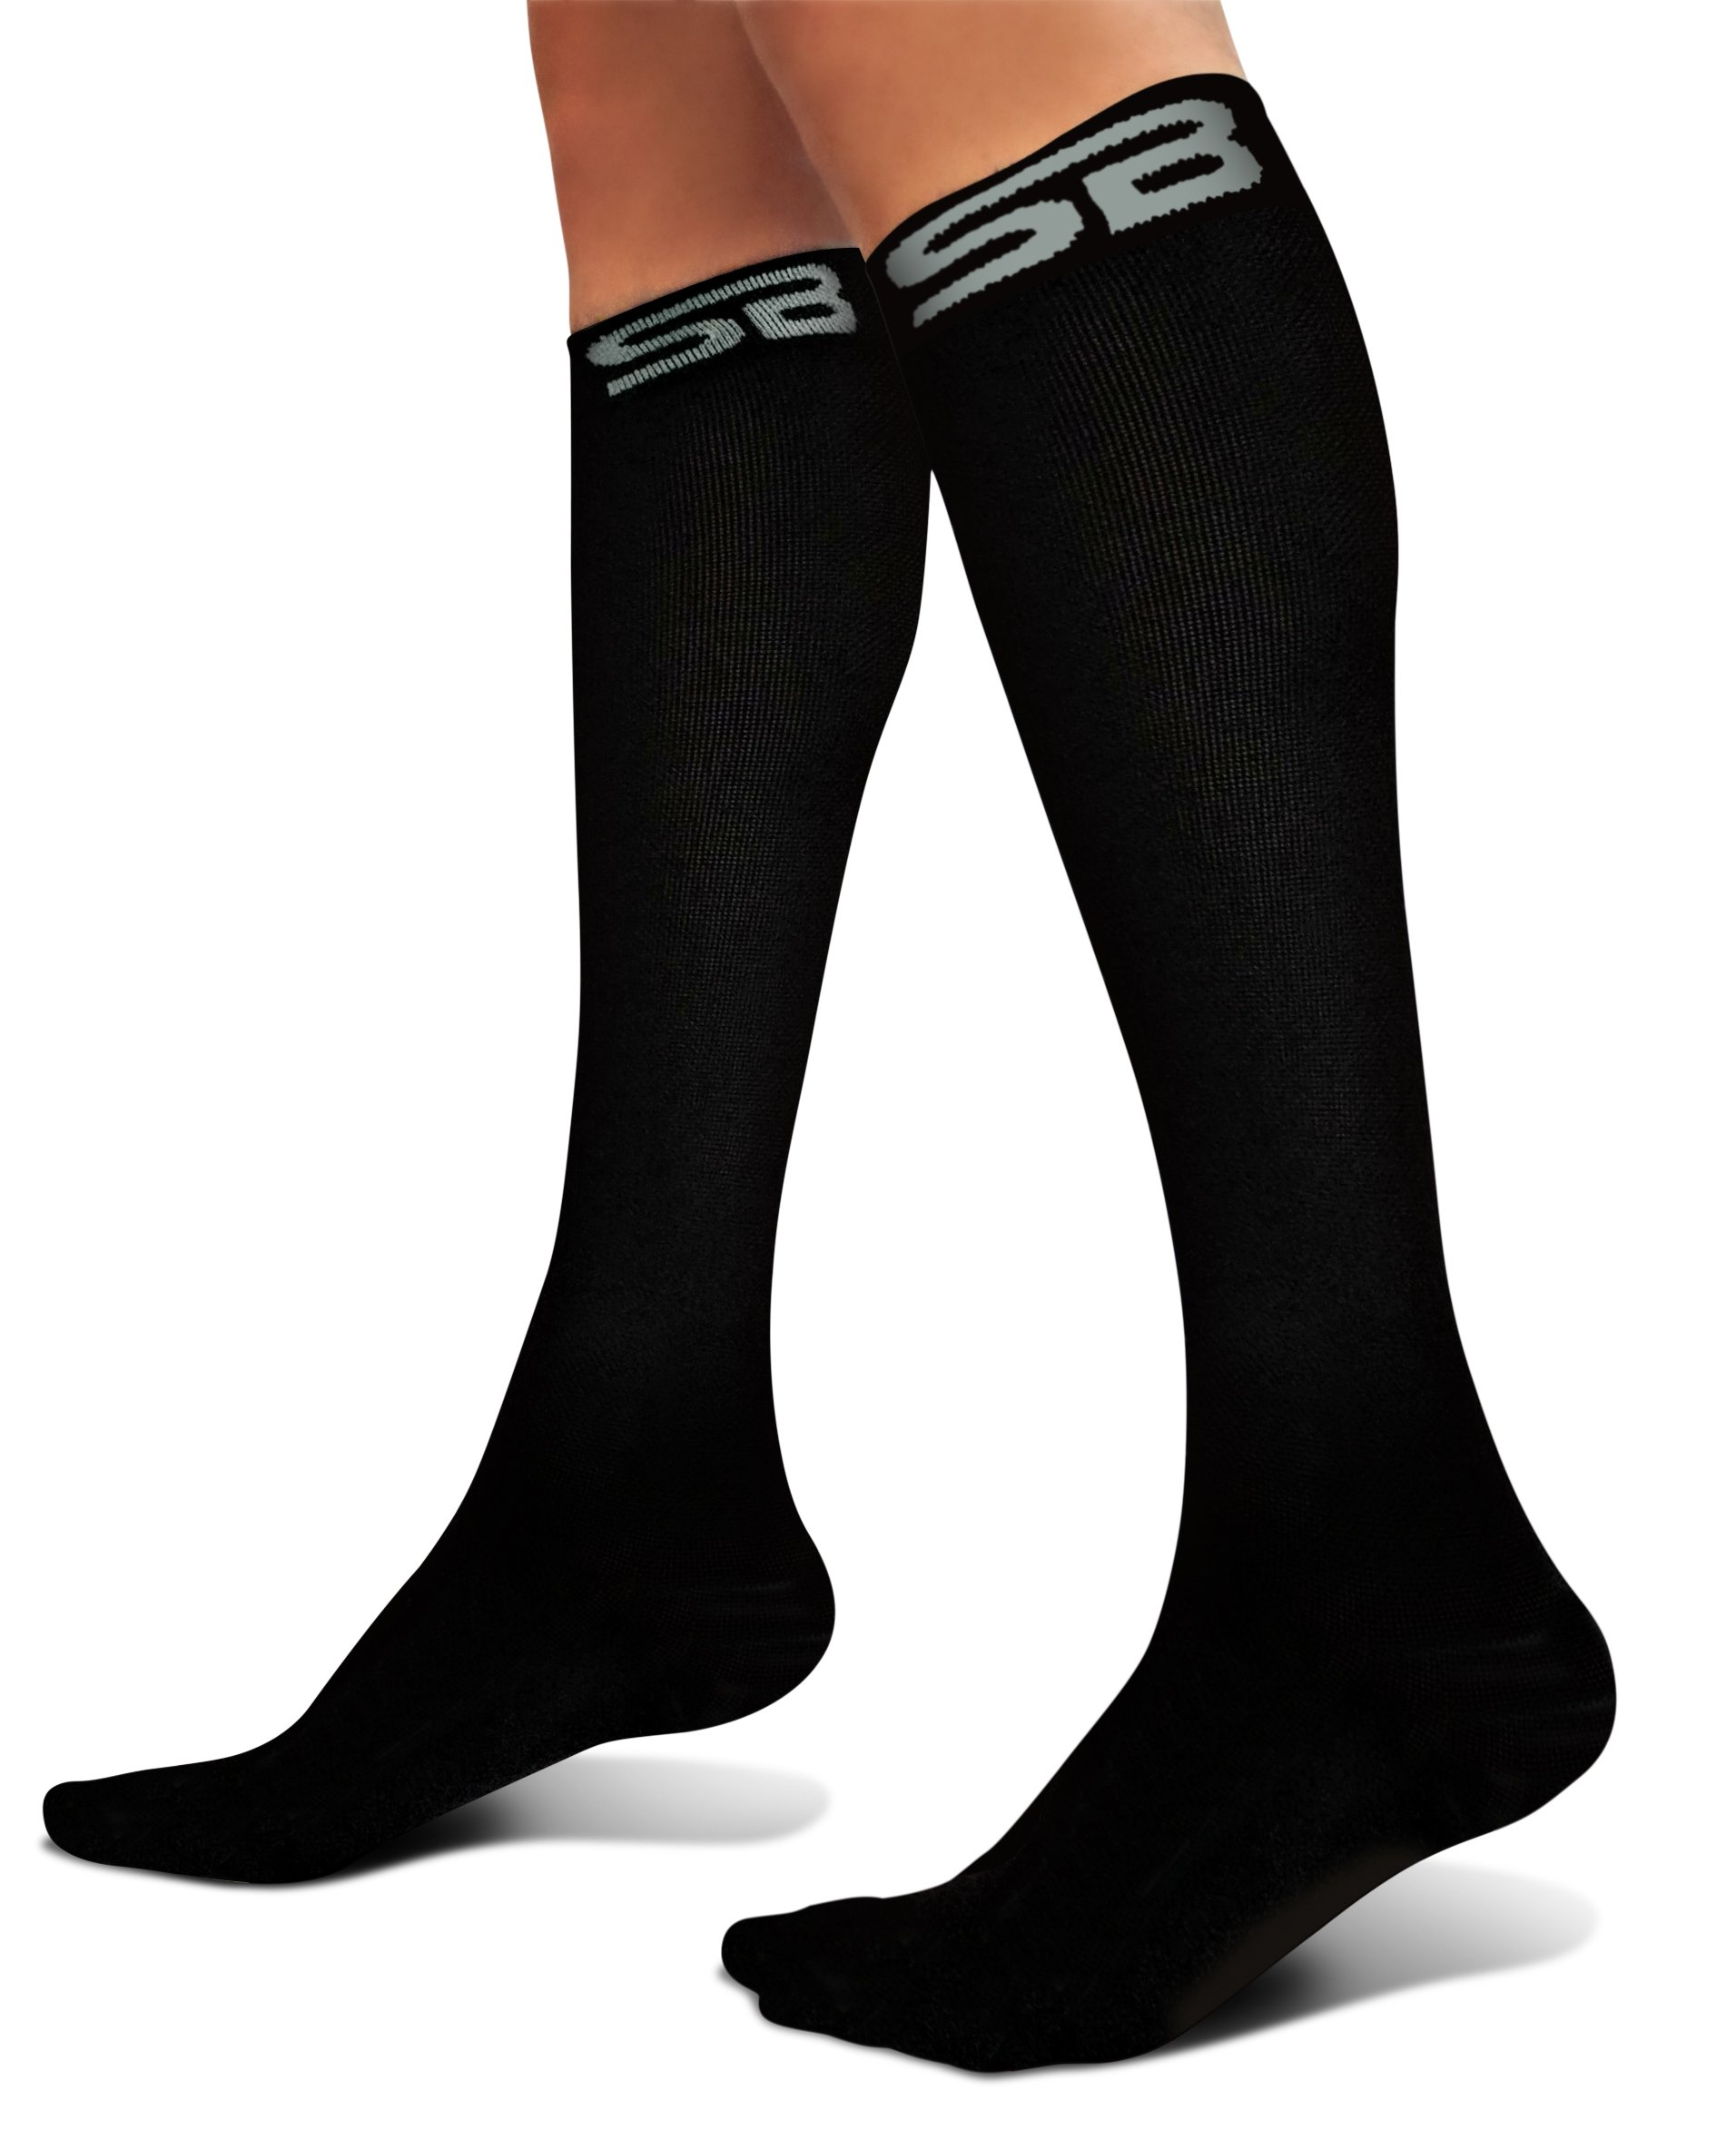 SB SOX Compression Socks (20-30mmHg) for Men & Women - Best Stockings for Running, Medical, Athletic, Edema, Diabetic, Varicose Veins, Travel, Pregnancy, Shin Splints (Solid - Black, X-Large)